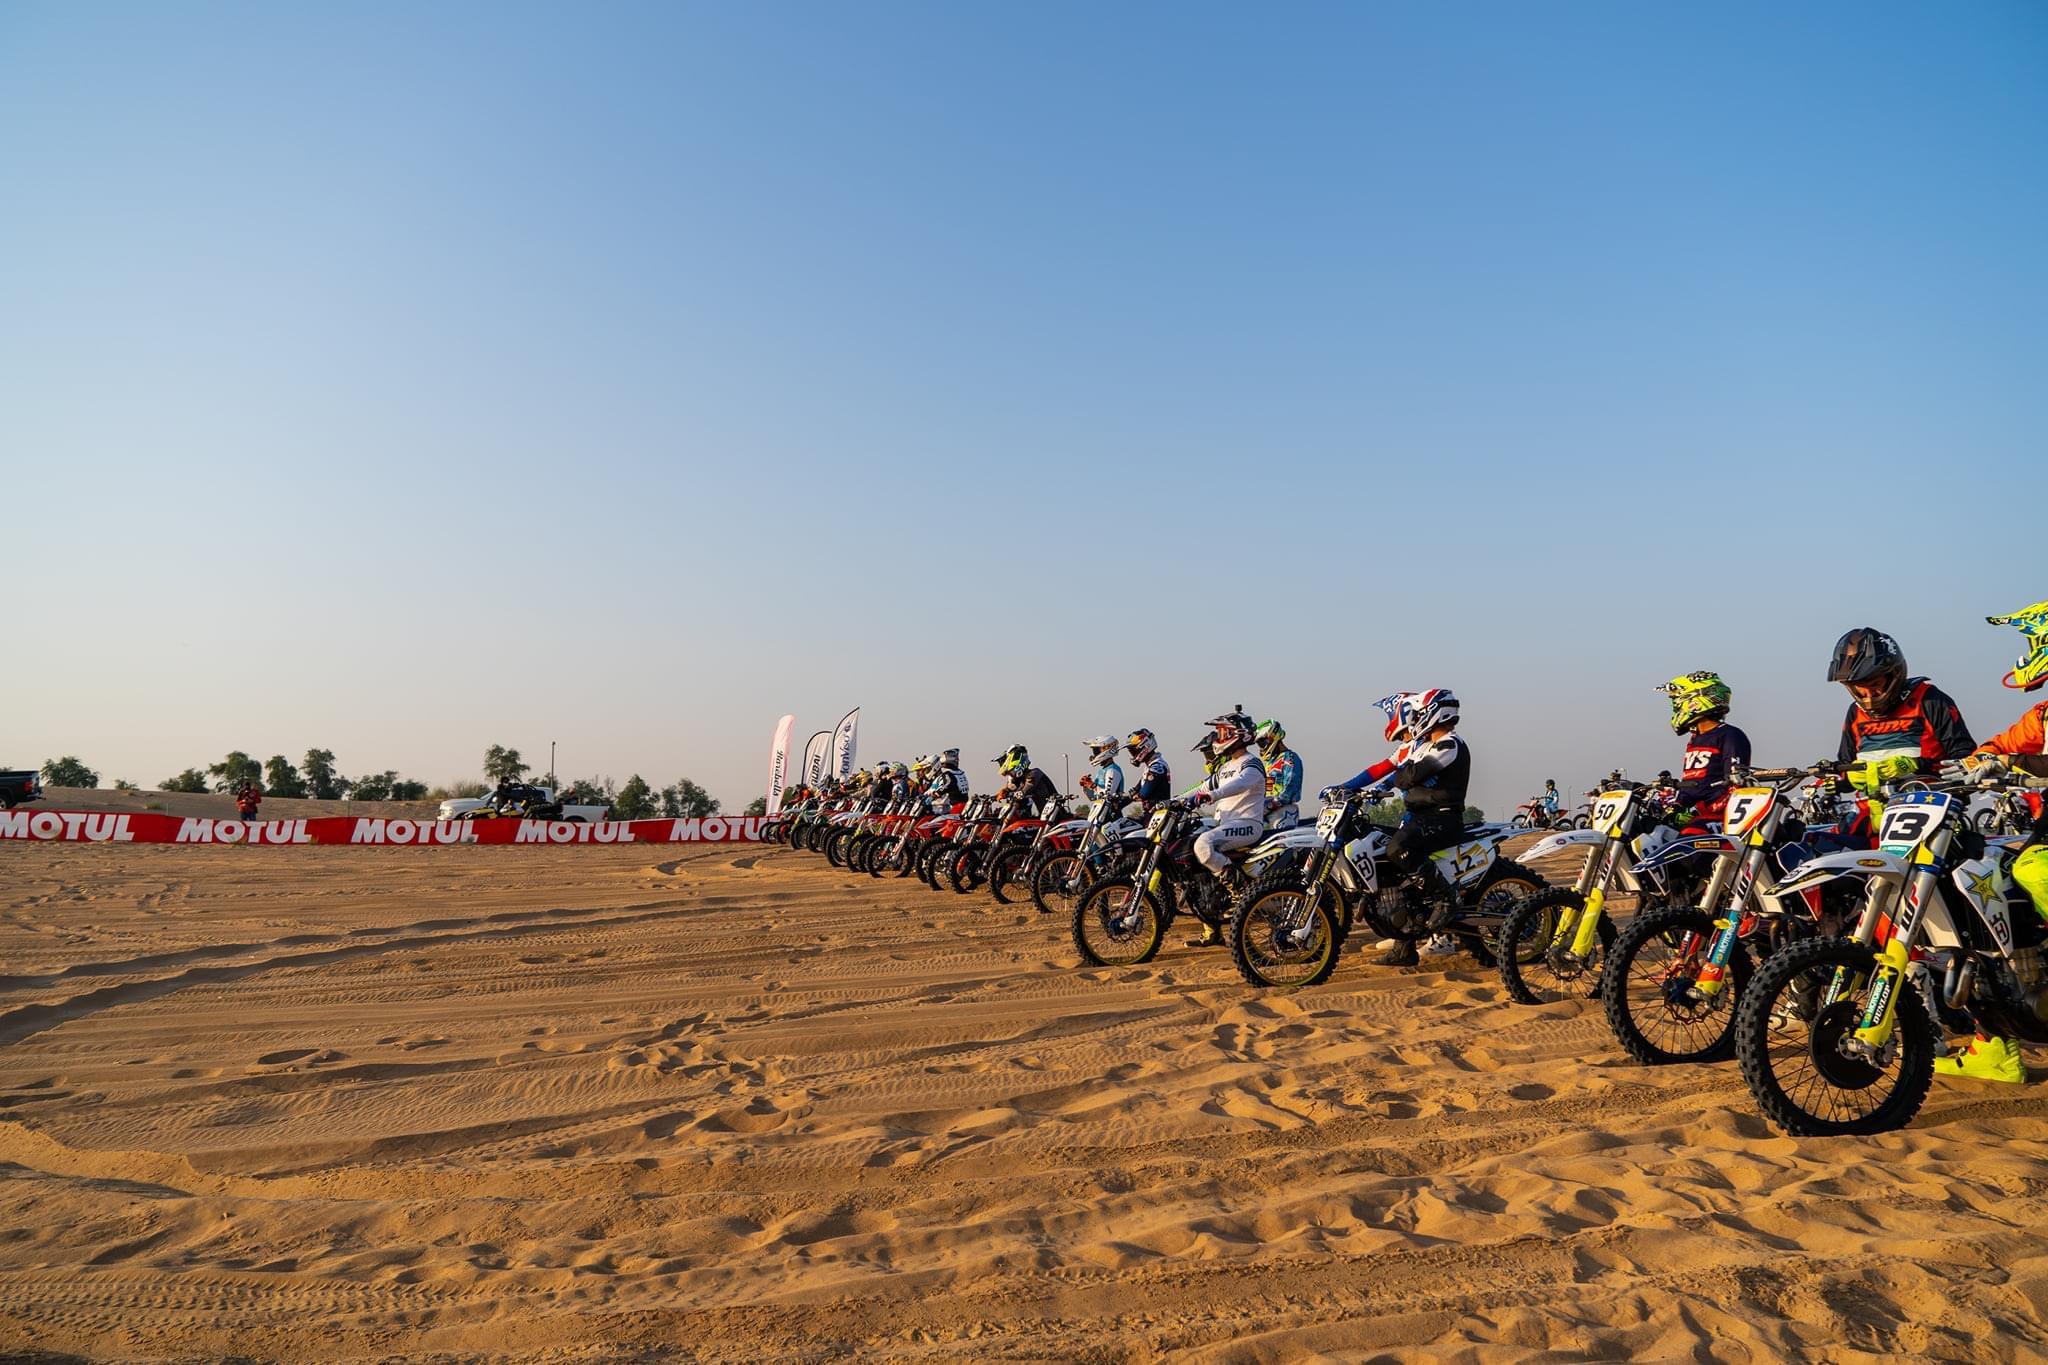 Dubai Endurocross (DEC) Championship